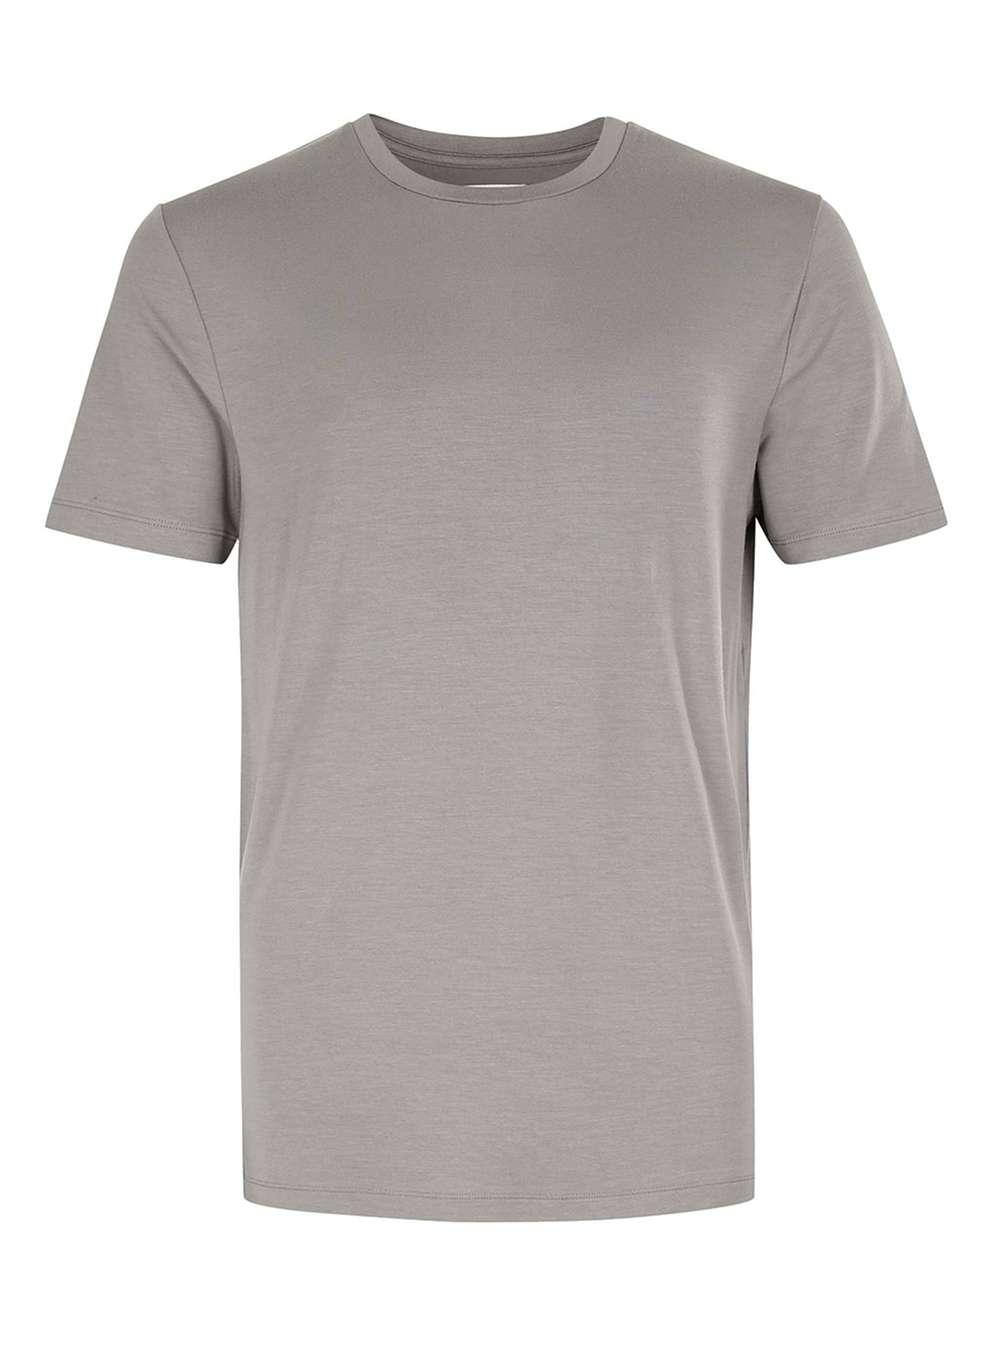 TOPMAN PREMIUM Grey Slinky Soft T-Shirt , £20